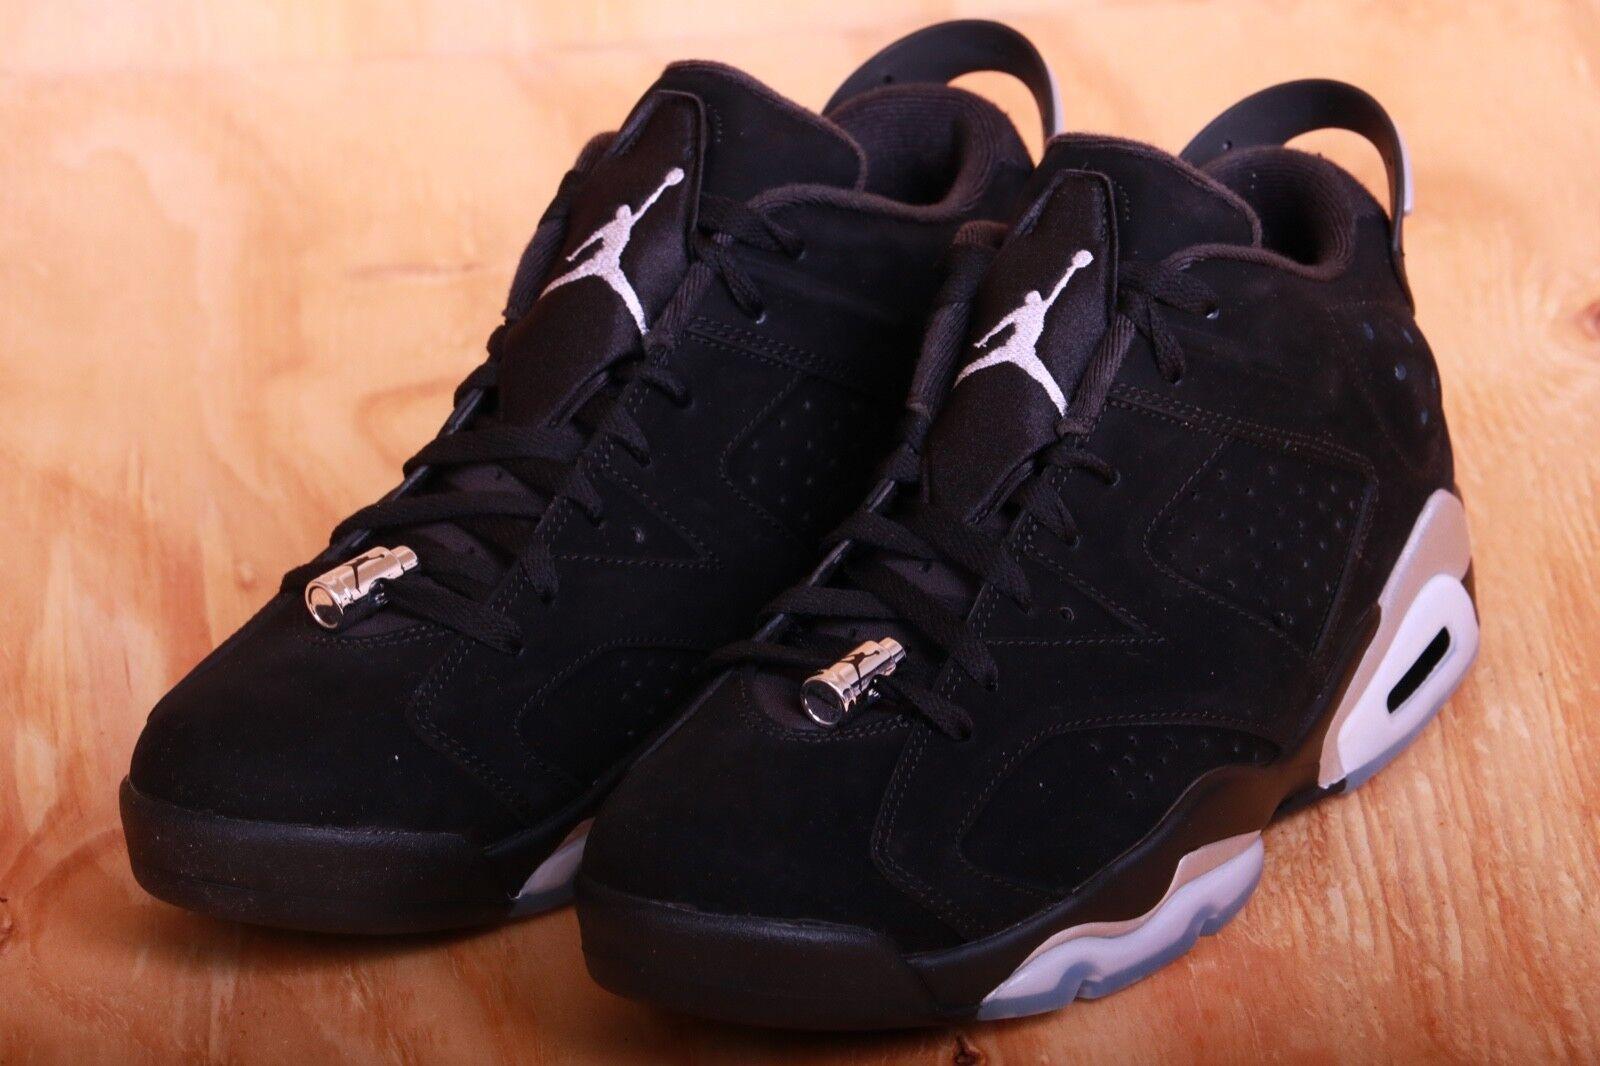 reputable site 52122 dd696 Nike Mens Air Jordan 6 Retro Black Metallic Sliver Sliver Sliver 304401 003  Size 9.5 dc456a